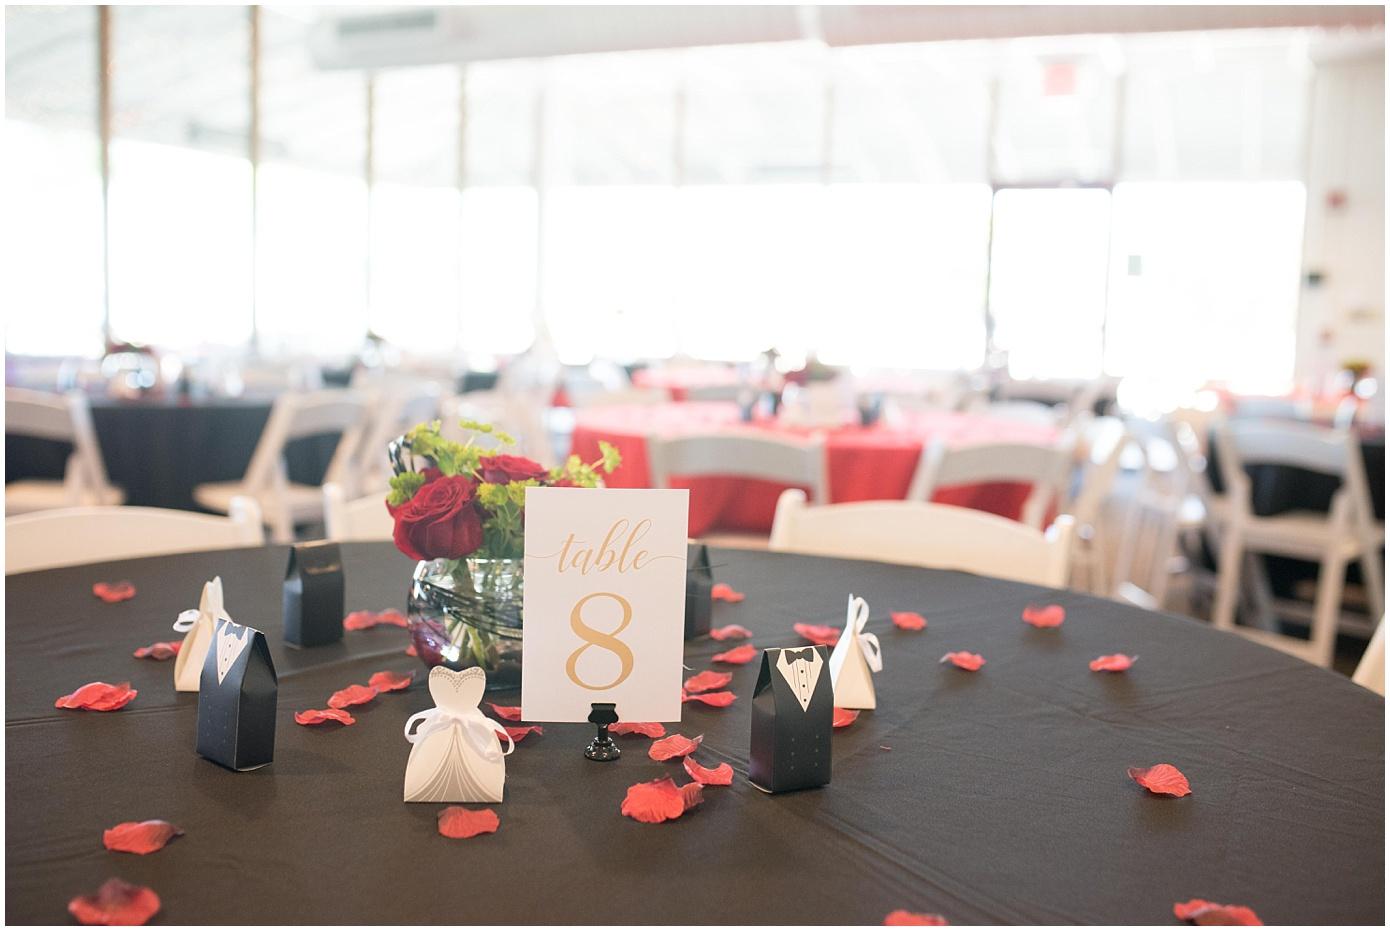 kayla kitts photography-justine-brian-wedding-balloon-fiesta_0037.jpg